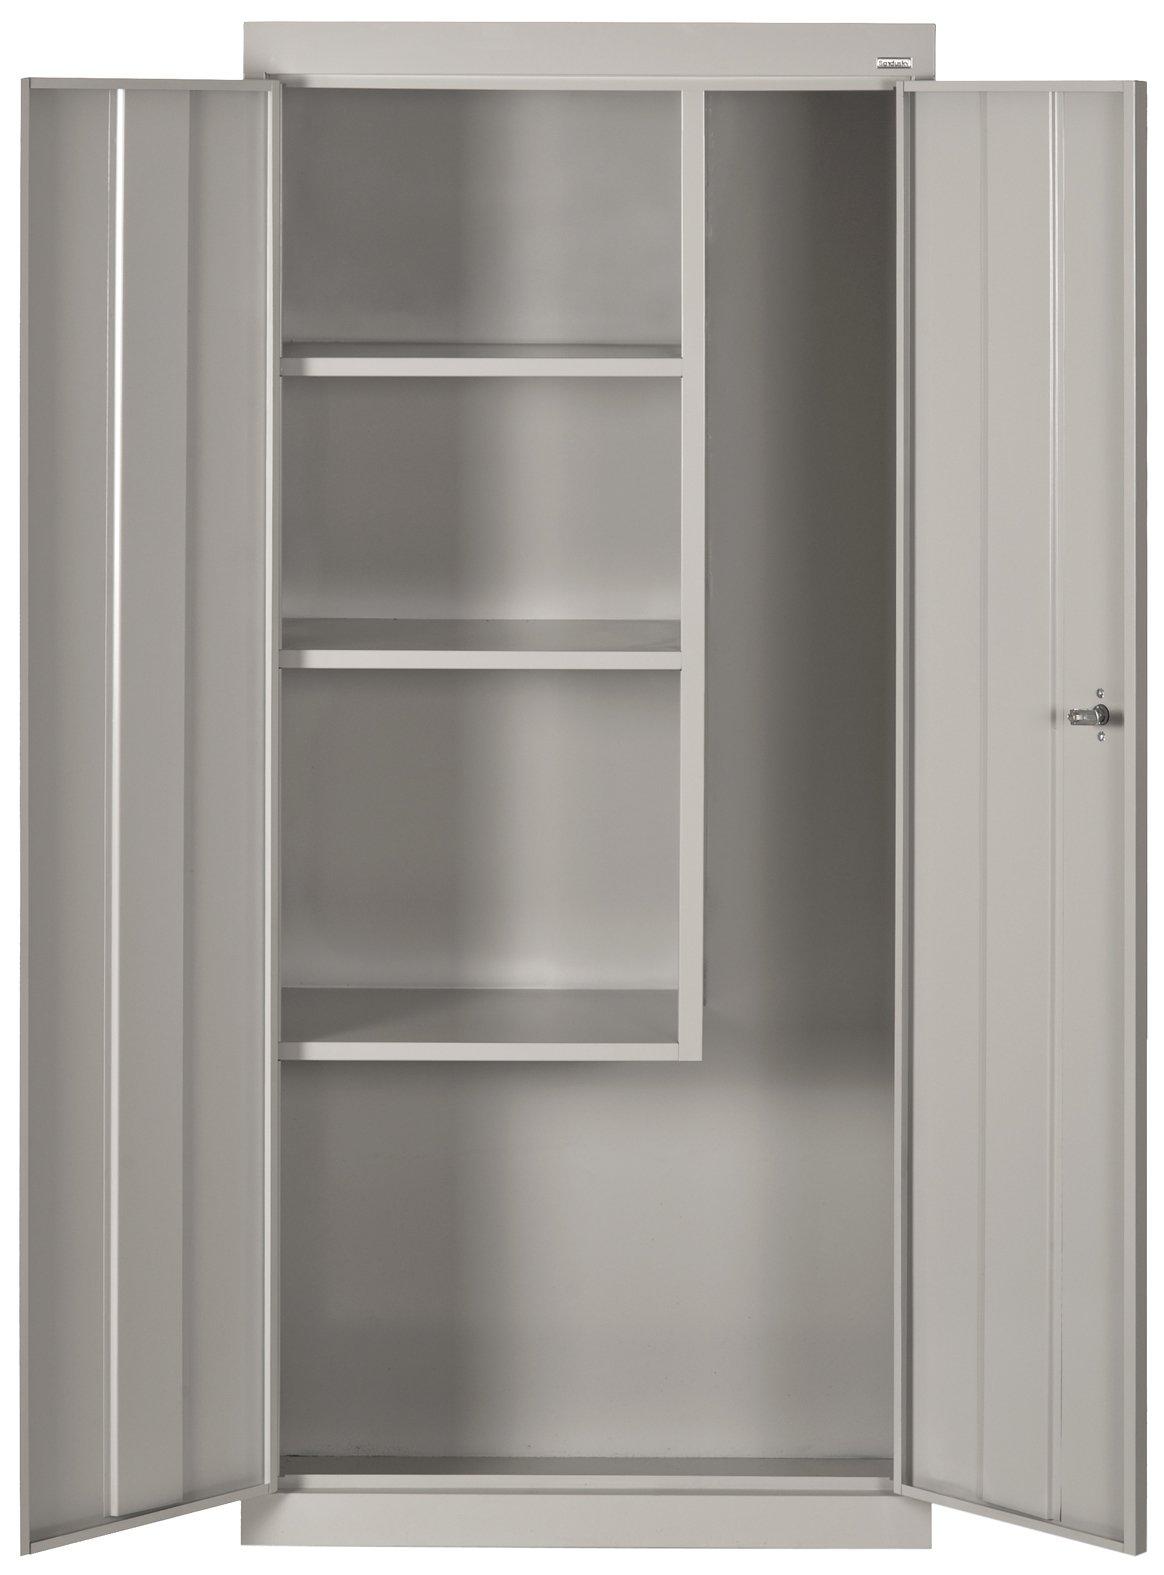 Sandusky Lee Steel Janitorial/Supply Cabinet, 3